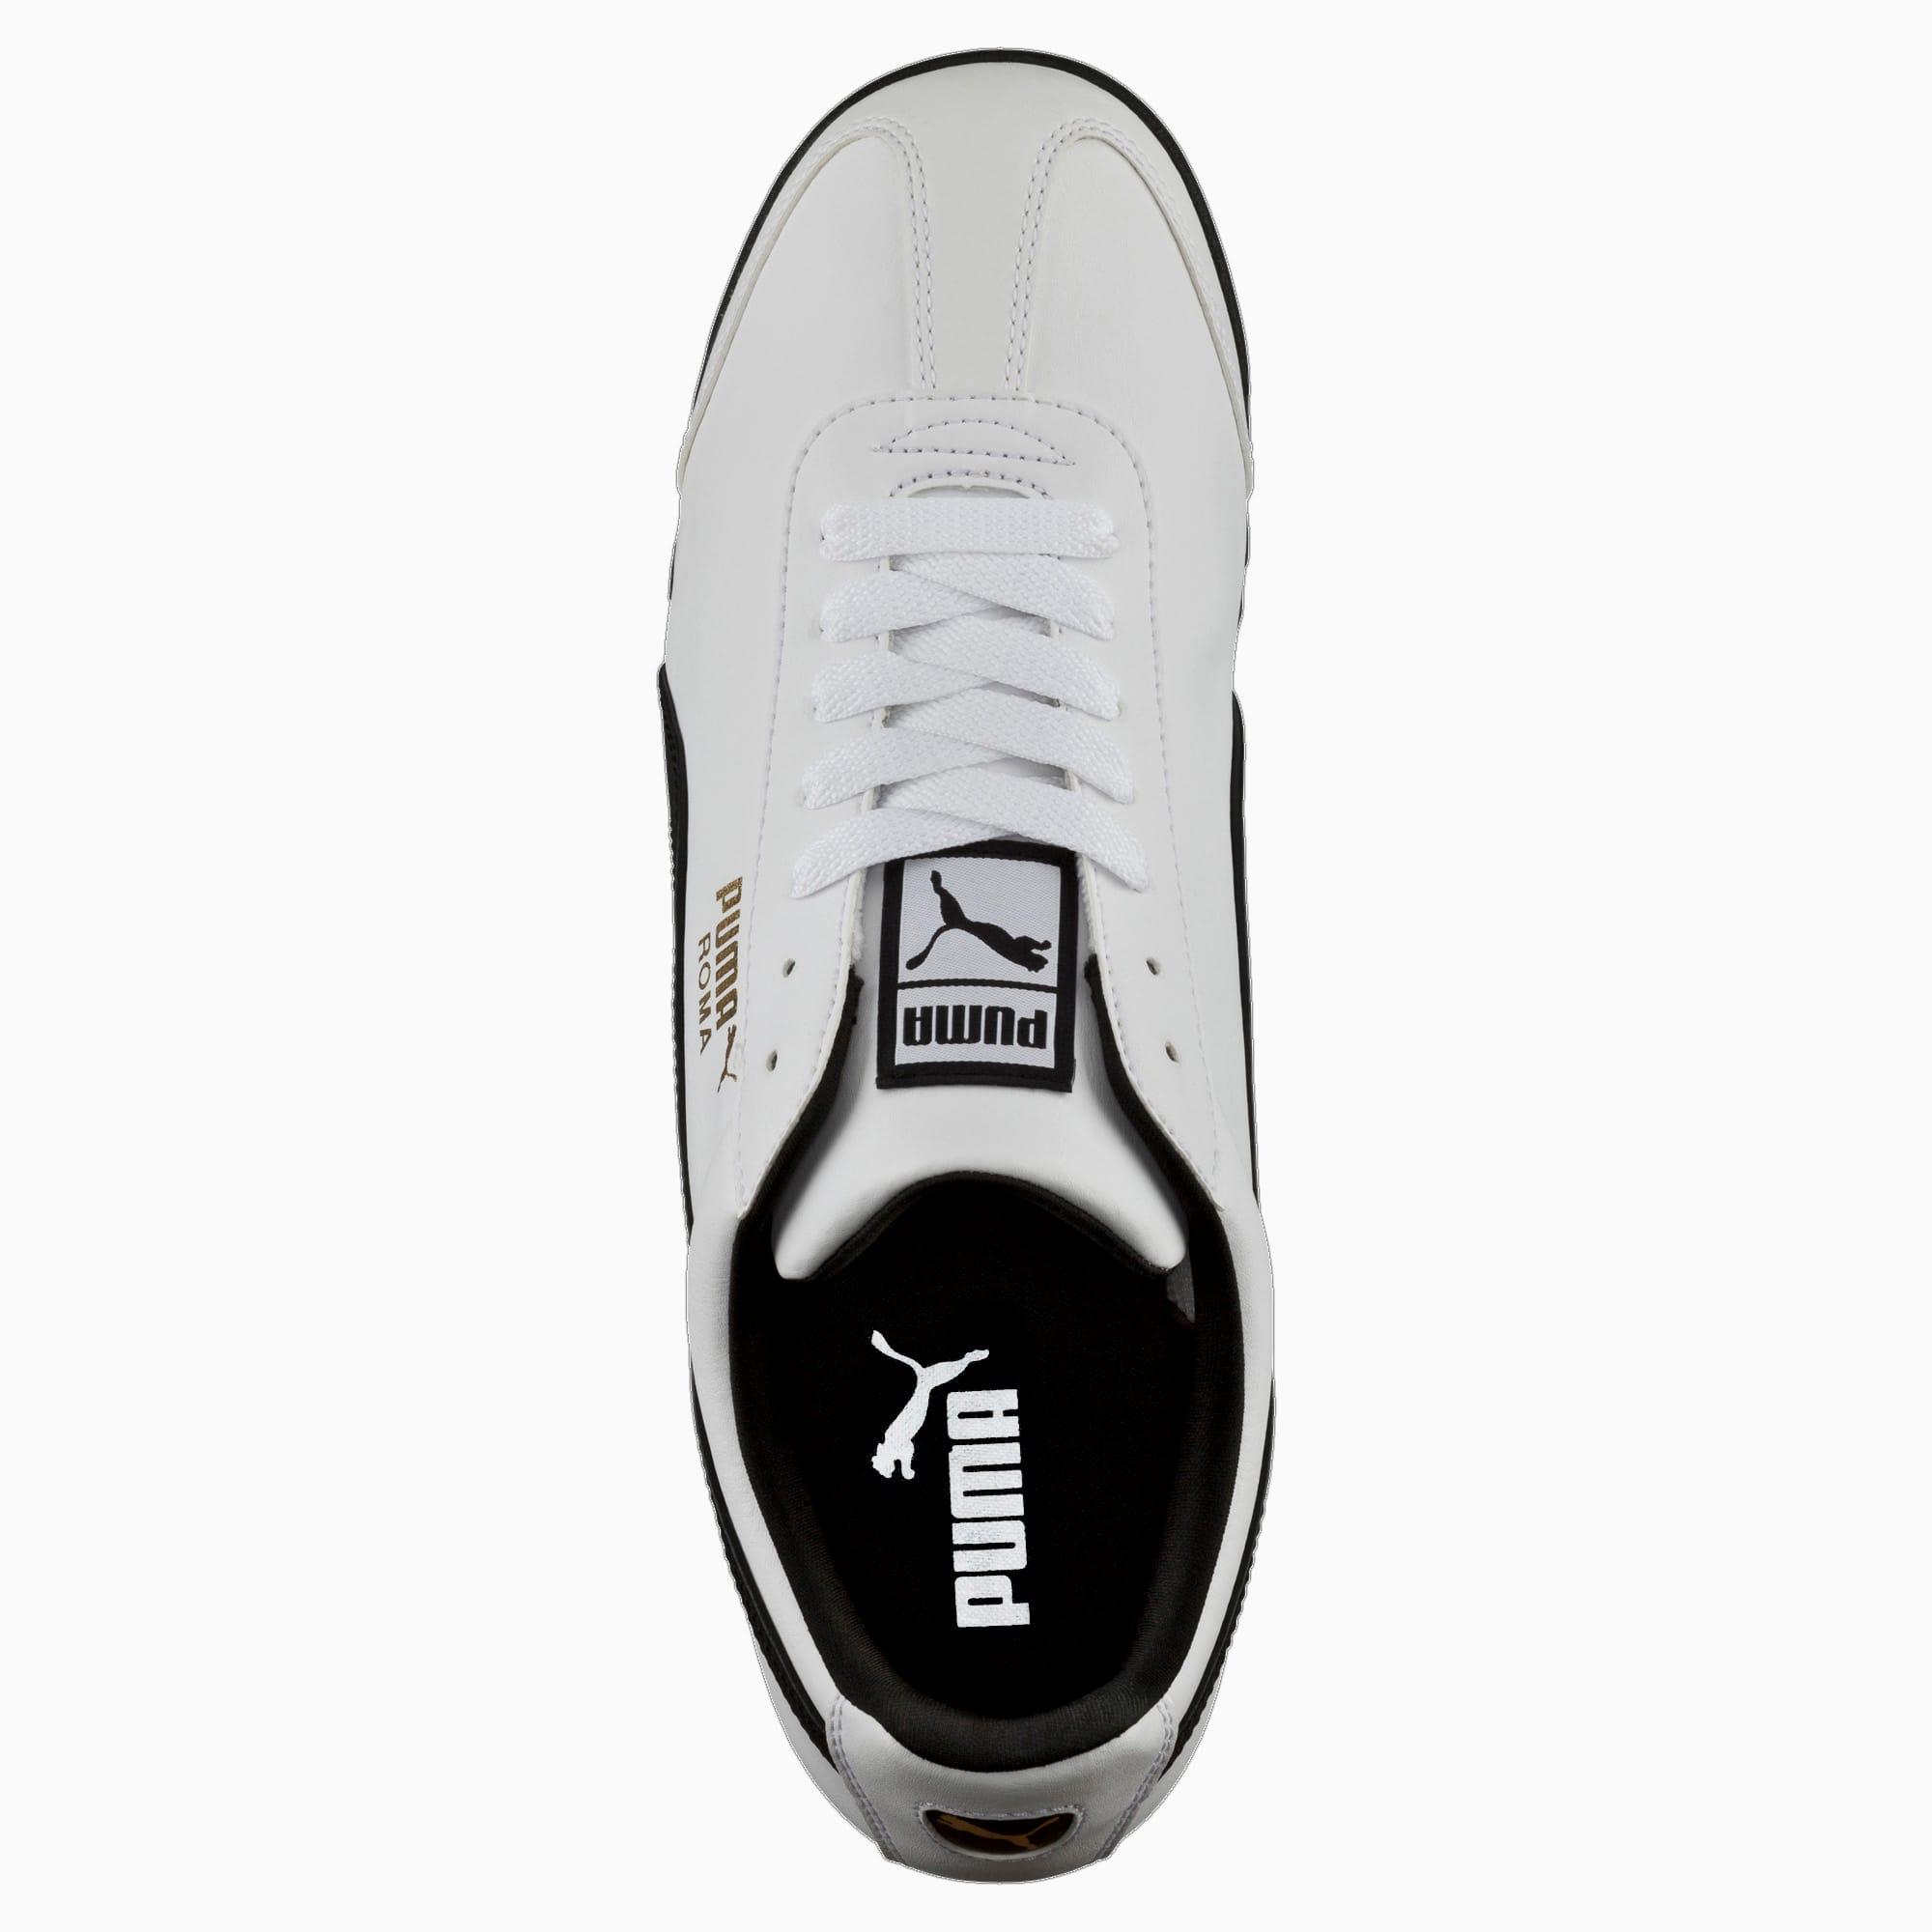 PUMA Roma Basic Shoes Synthetic Black White Classic Men Sneakers 353572 11